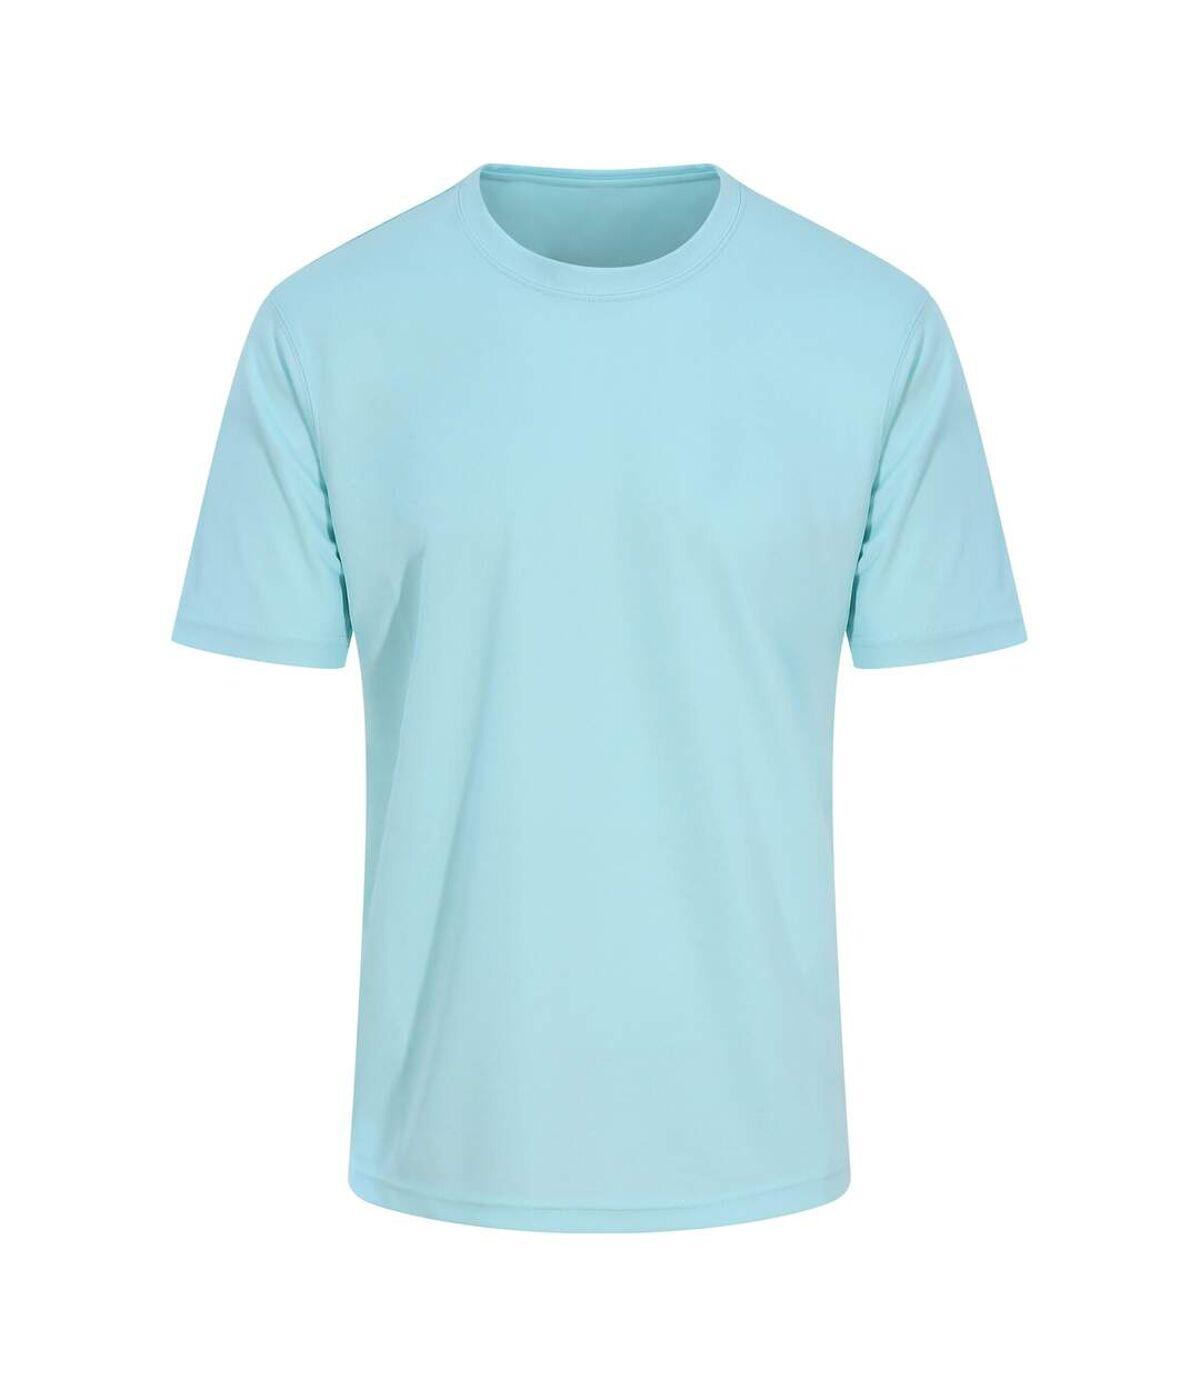 AWDis Just Cool Mens Performance Plain T-Shirt (Mint) - UTRW683